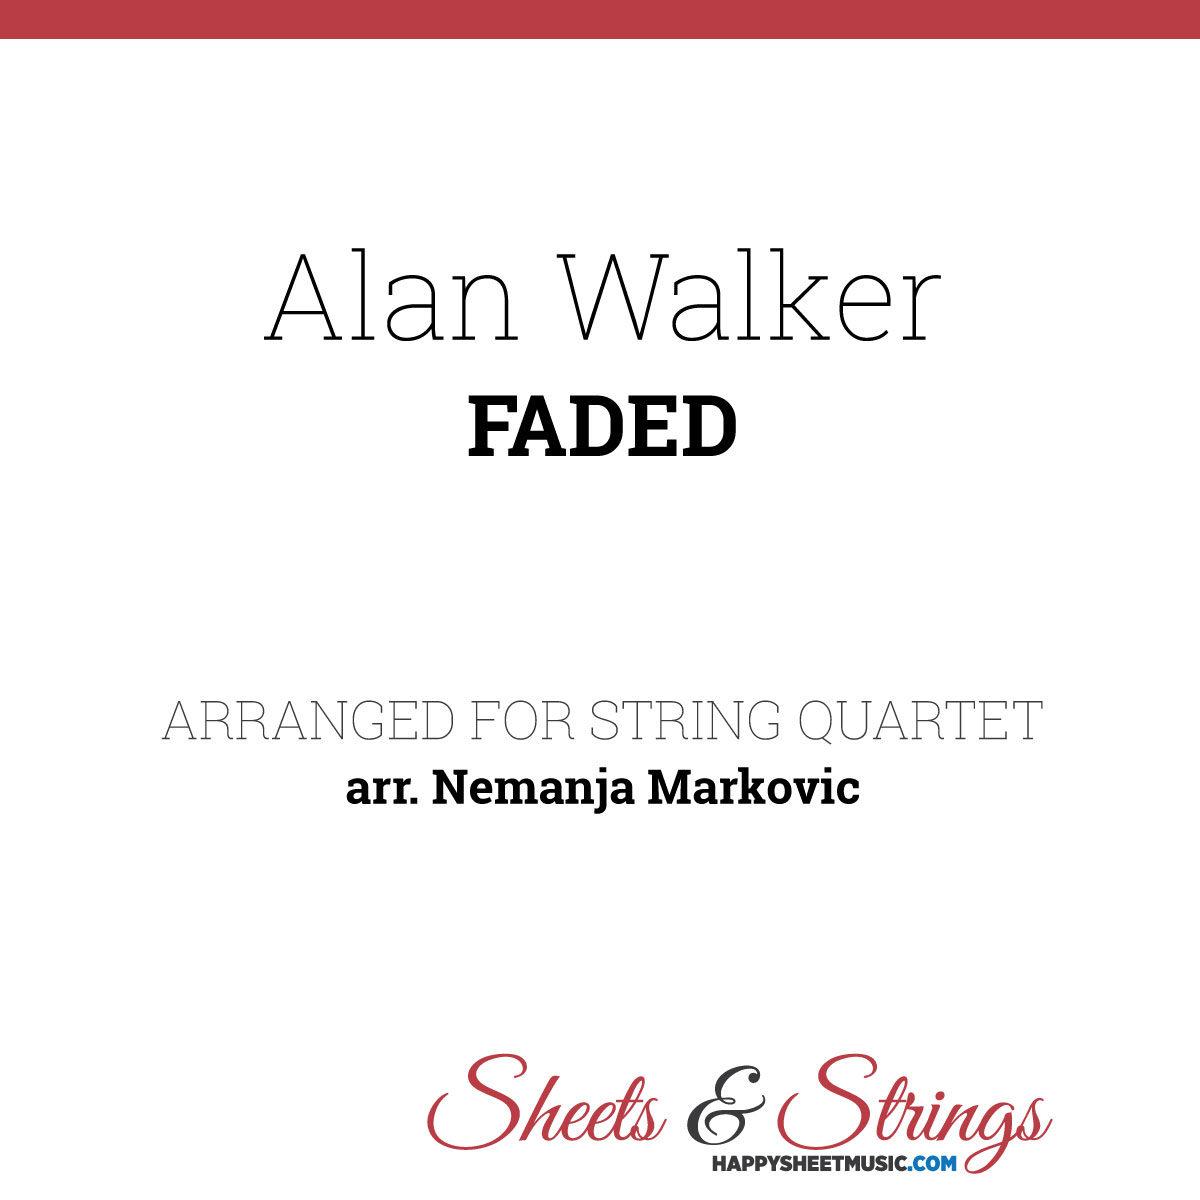 Alan Walker - Faded Sheet Music for String Quartet - Music Arrangements